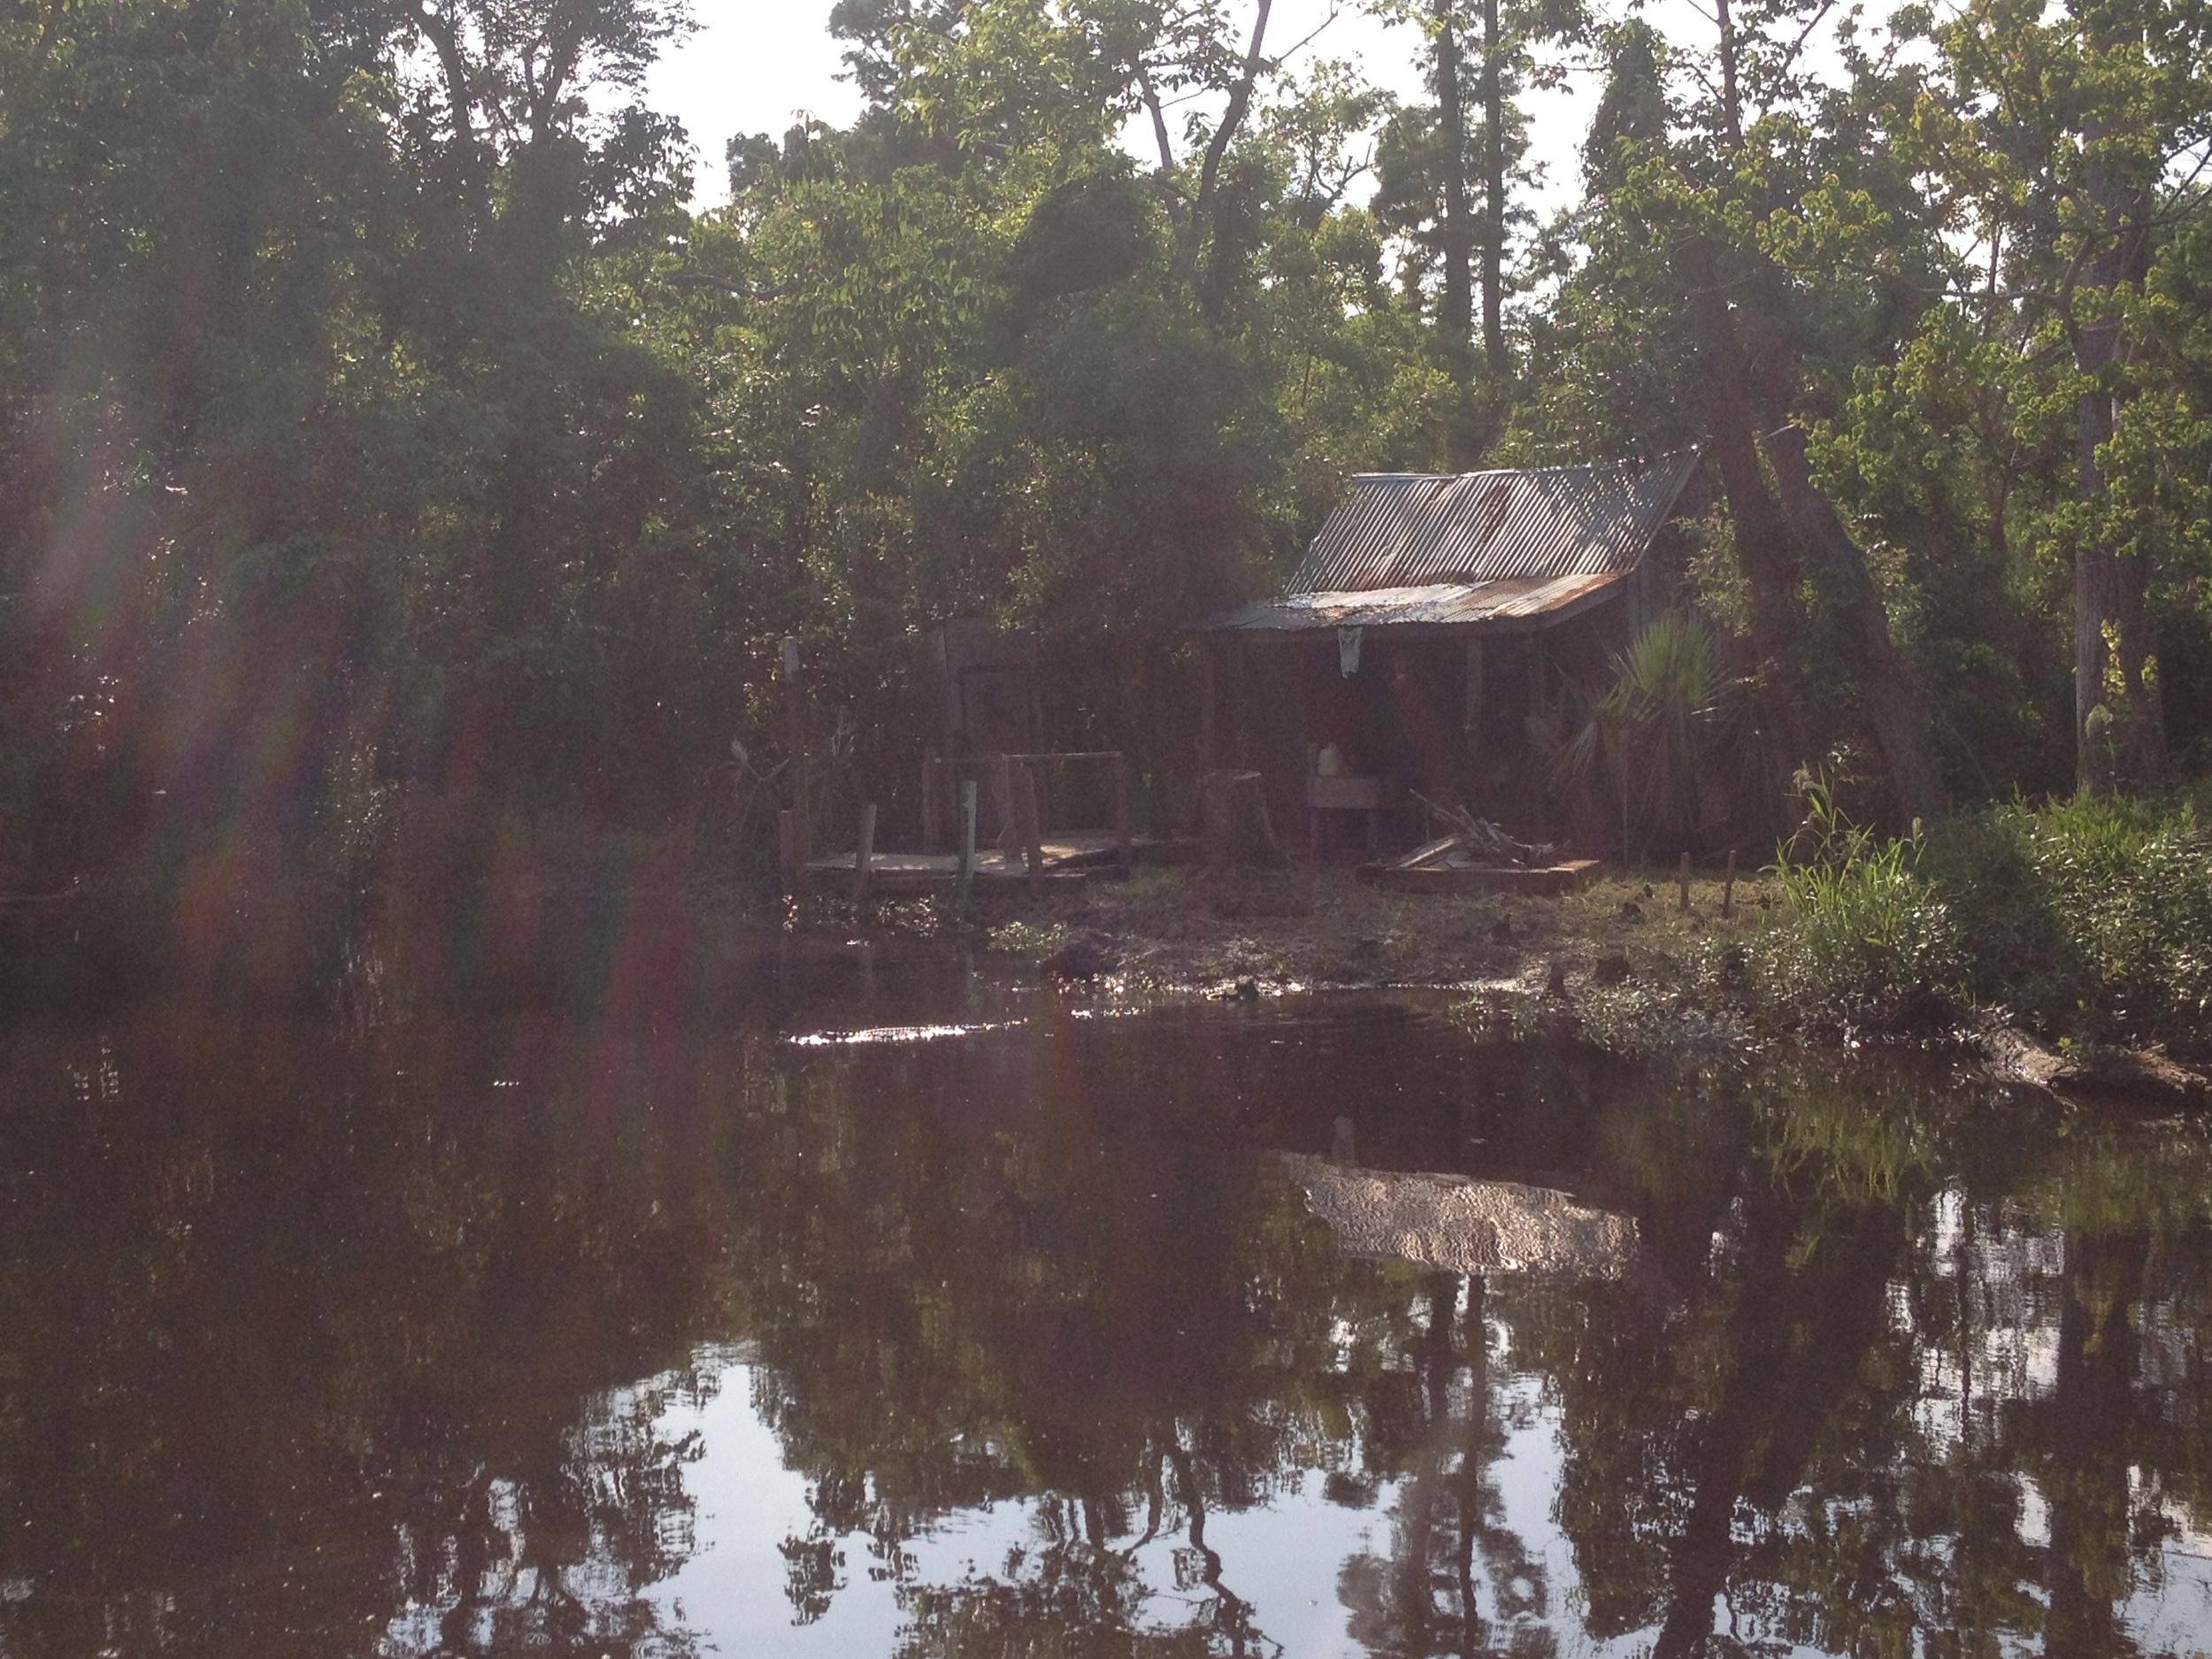 Old Boat House - Cajun Encounters (La Place, LA)